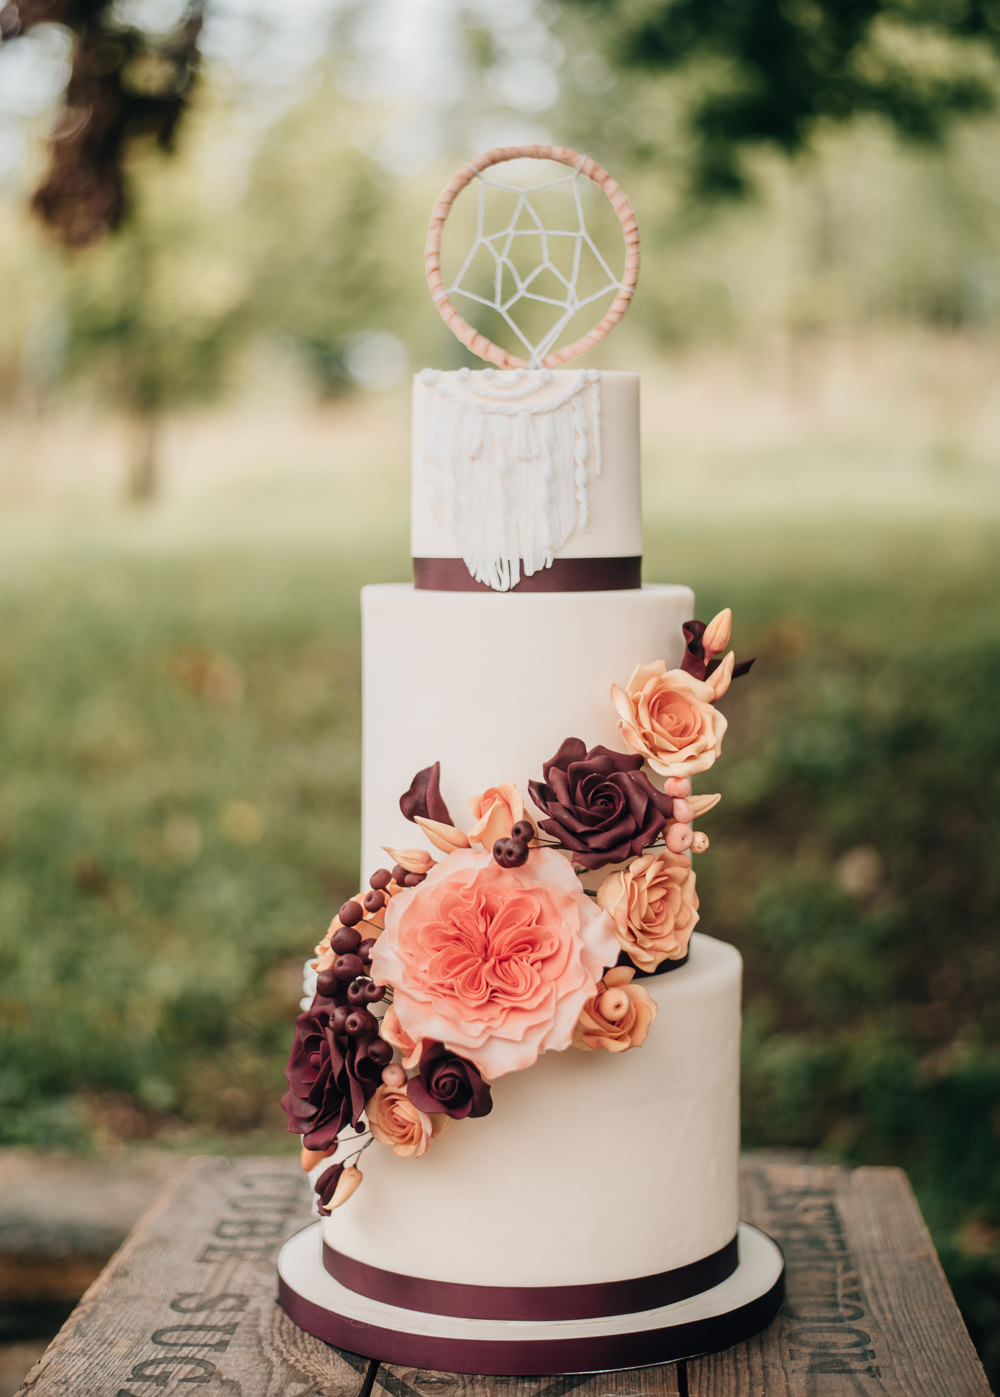 Iced Cake Sugar Flowers Dream Catcher Macrame Burgundy Orange Eco Friendly Wedding Inspiration Sarah Jayne Photography